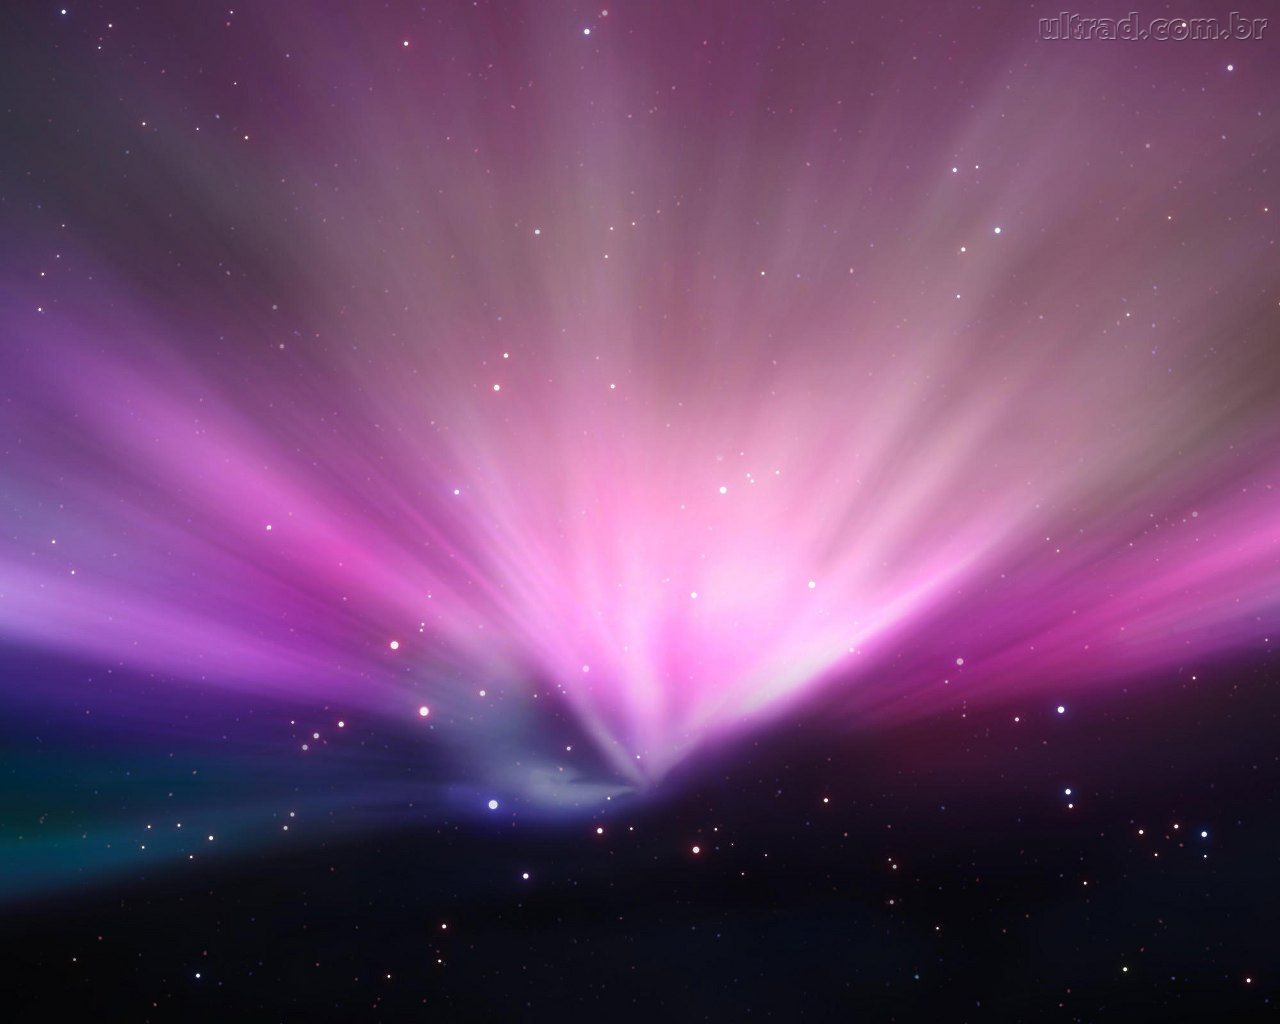 http://4.bp.blogspot.com/-D6W9yXLrKVI/Tmd9w9UkVcI/AAAAAAAAAG0/_Dw37SQCJg4/s1600/237355_Papel-de-Parede-Mac-OS-X-Aurora-Boreal_1280x1024.jpg